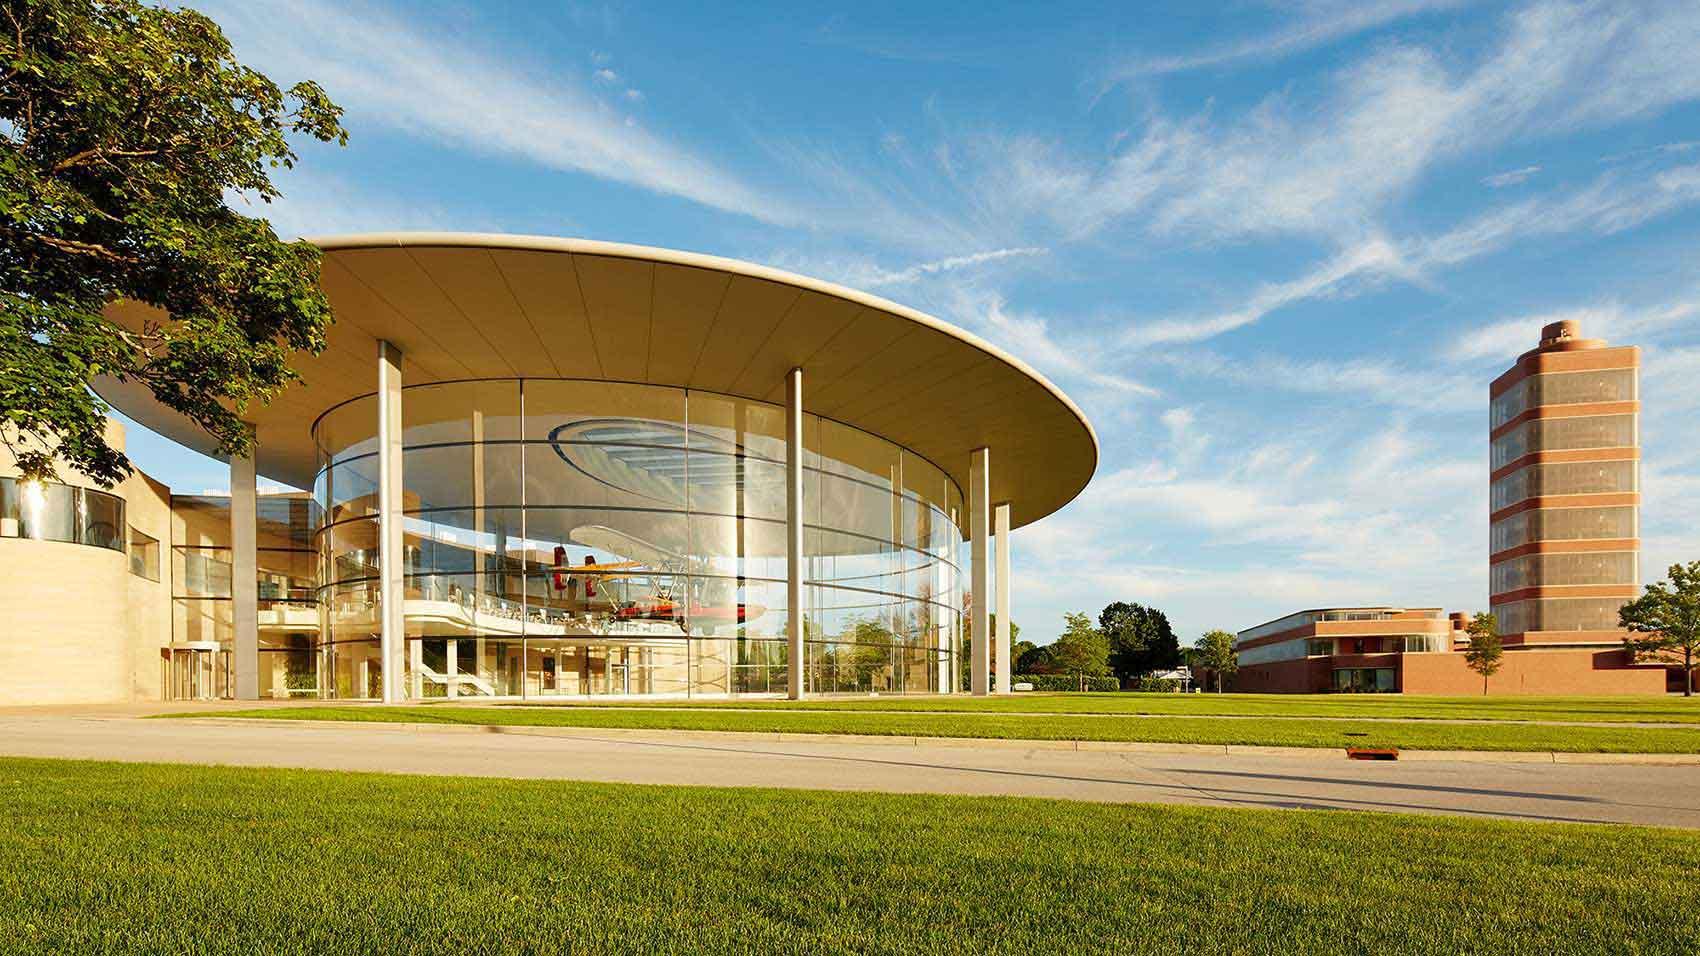 Fortaleza Hall 和 Frank Lloyd Wright 设计的研究大楼所在的庄臣全球总部园区